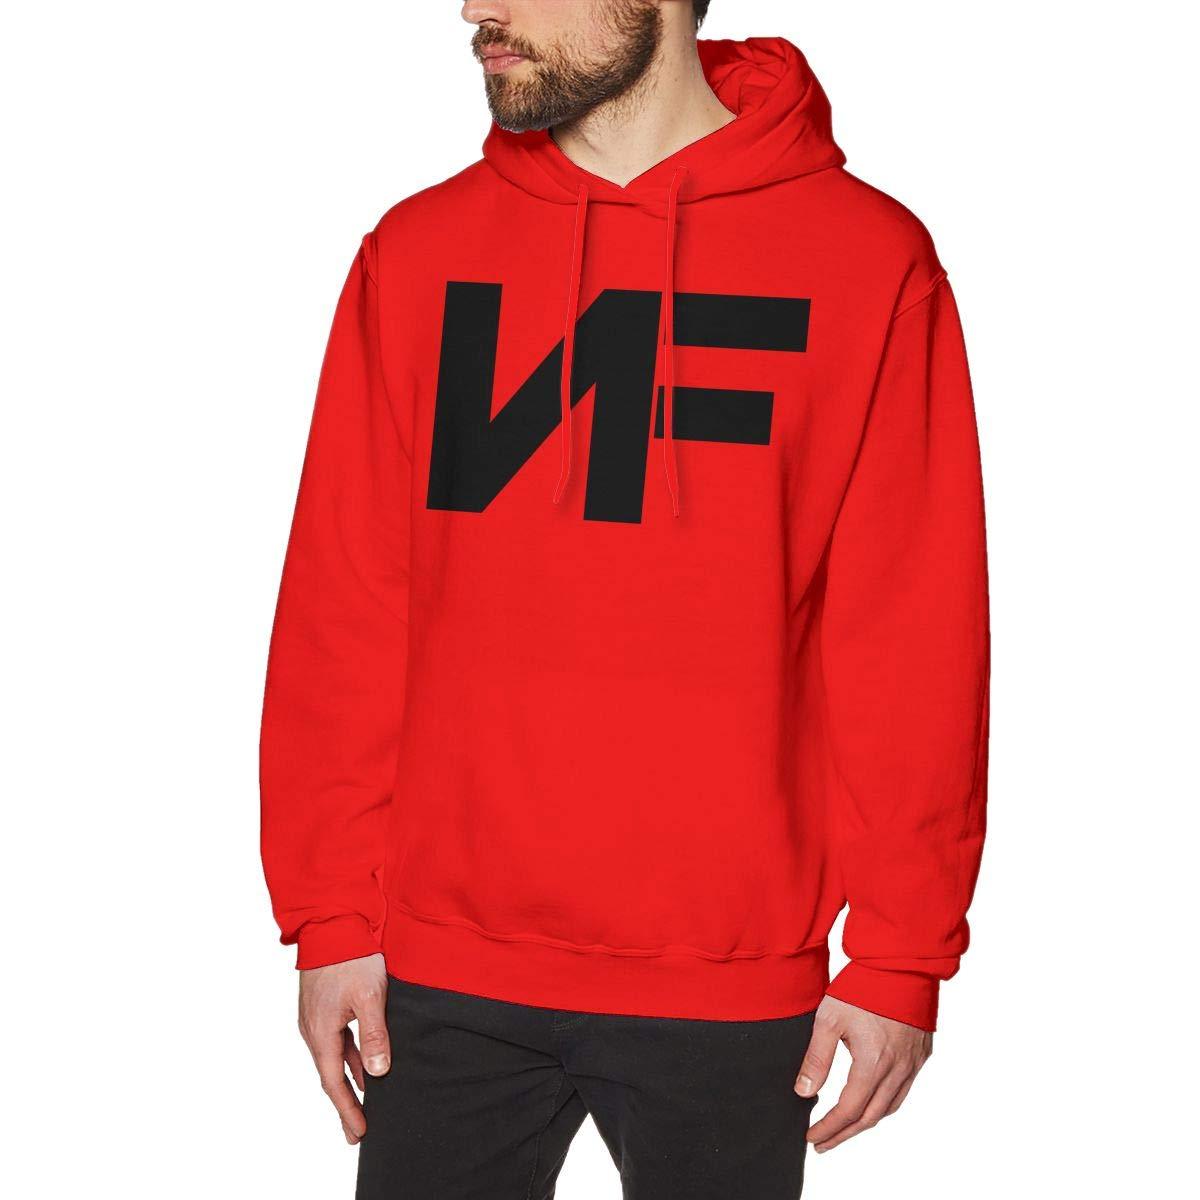 Men's NF Rapper Logo-Black Logo Hoodie Custom Pullover Sweatshirt Long Sleeve Hoodies Hooded for Youth Boys Men Red L by Cxcai